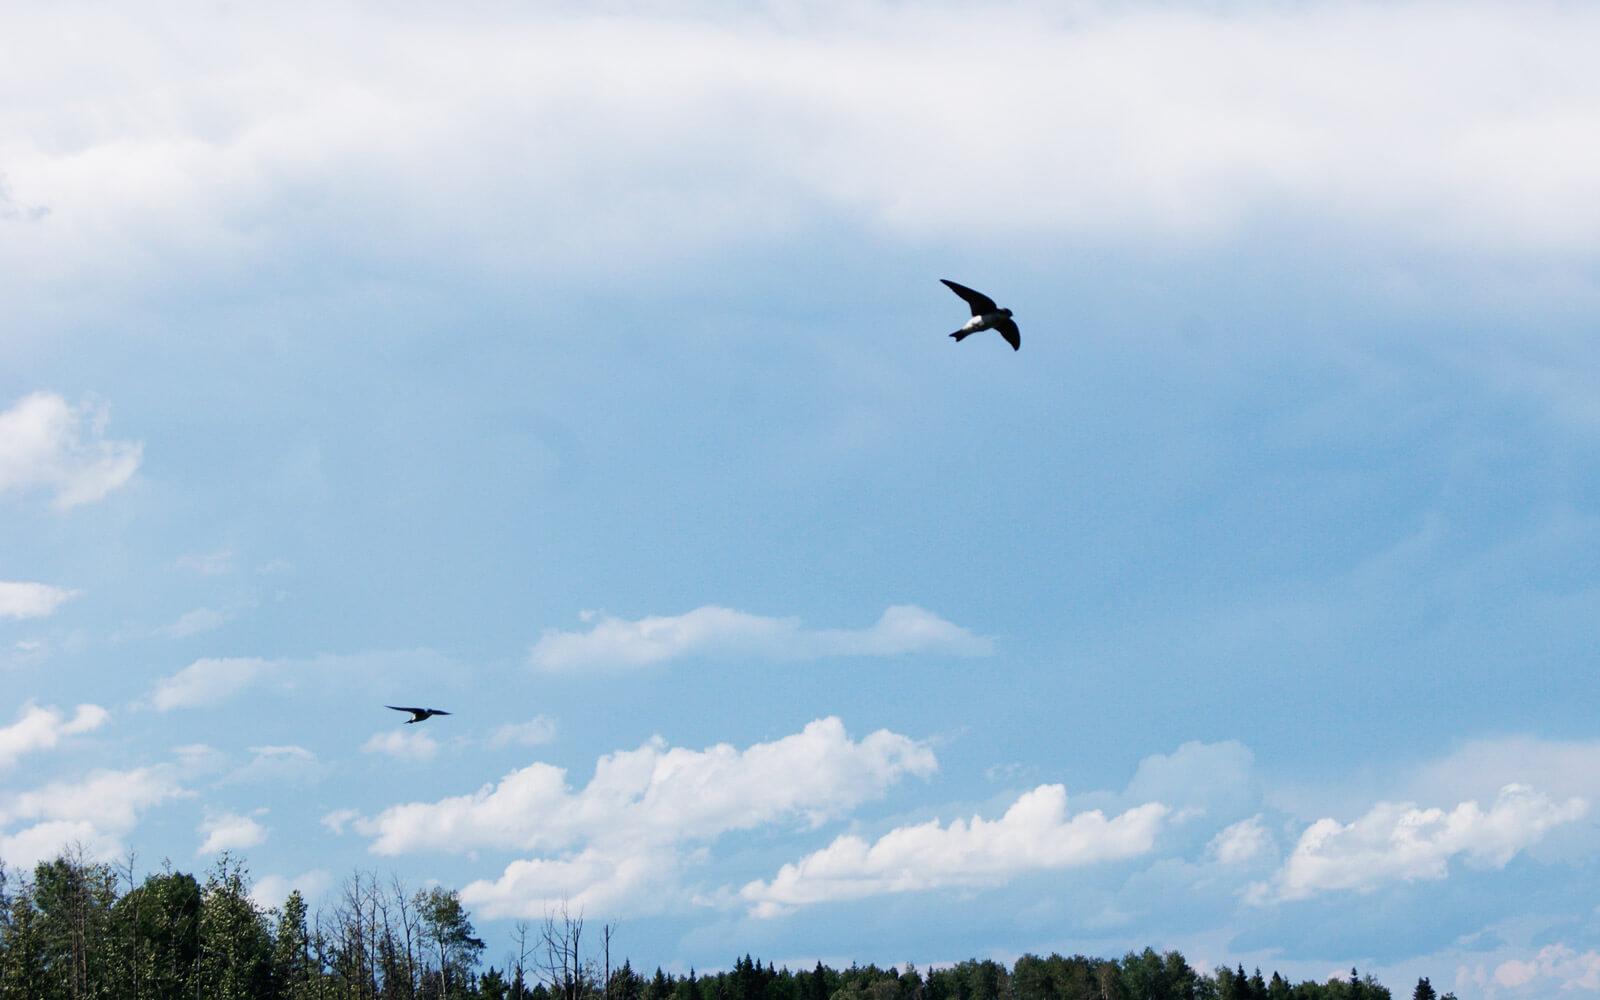 Vögel im blauen Himmel